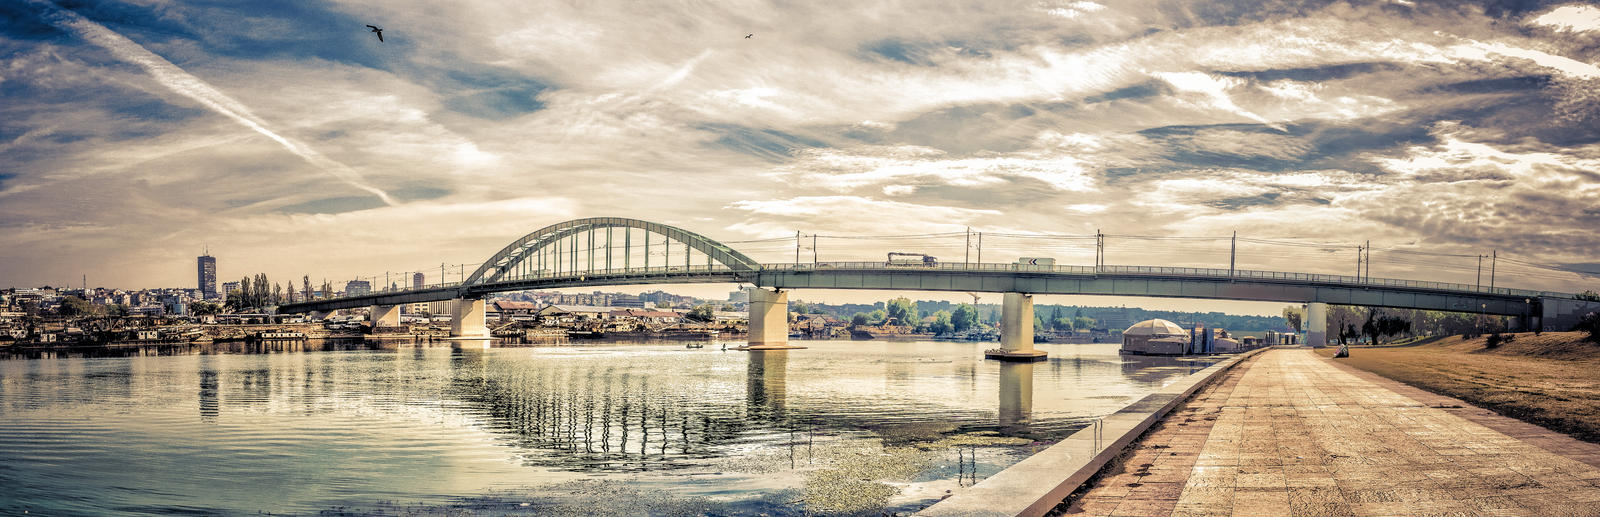 Panorama tramvajskog mosta by Srdjan011